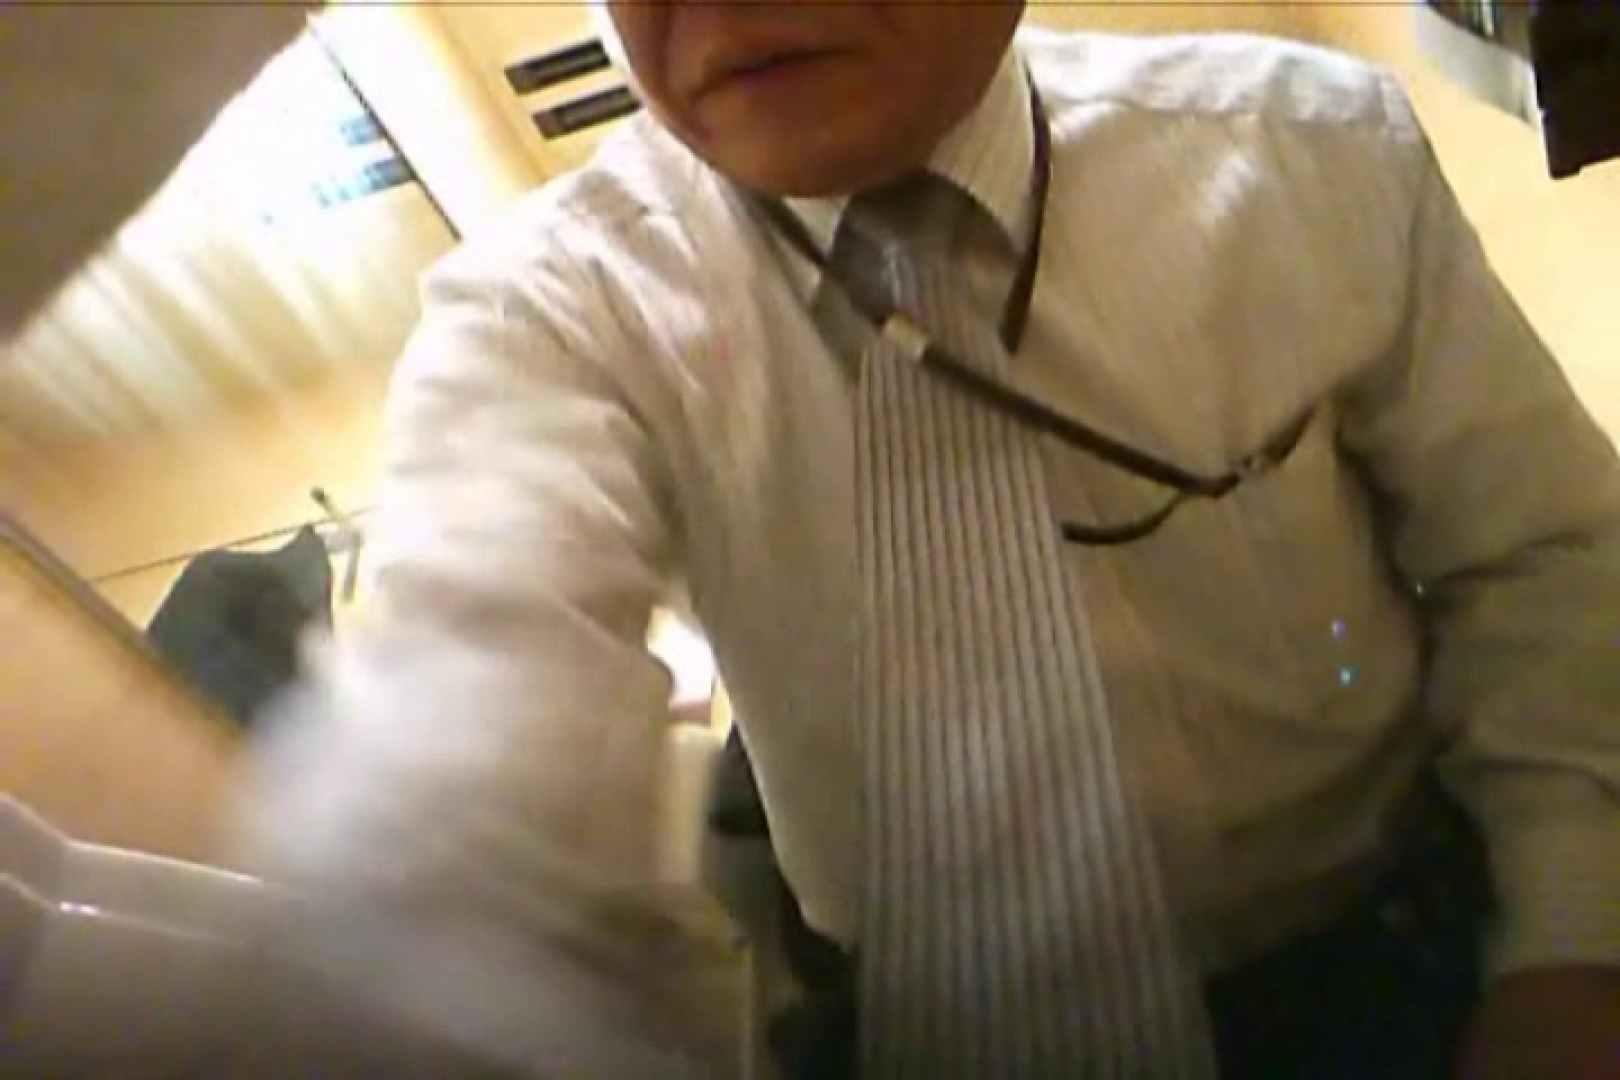 SEASON 2ND!掴み取りさんの洗面所覗き!in新幹線!VOL.06 リーマン系な男たち ゲイ無料エロ画像 74連発 57